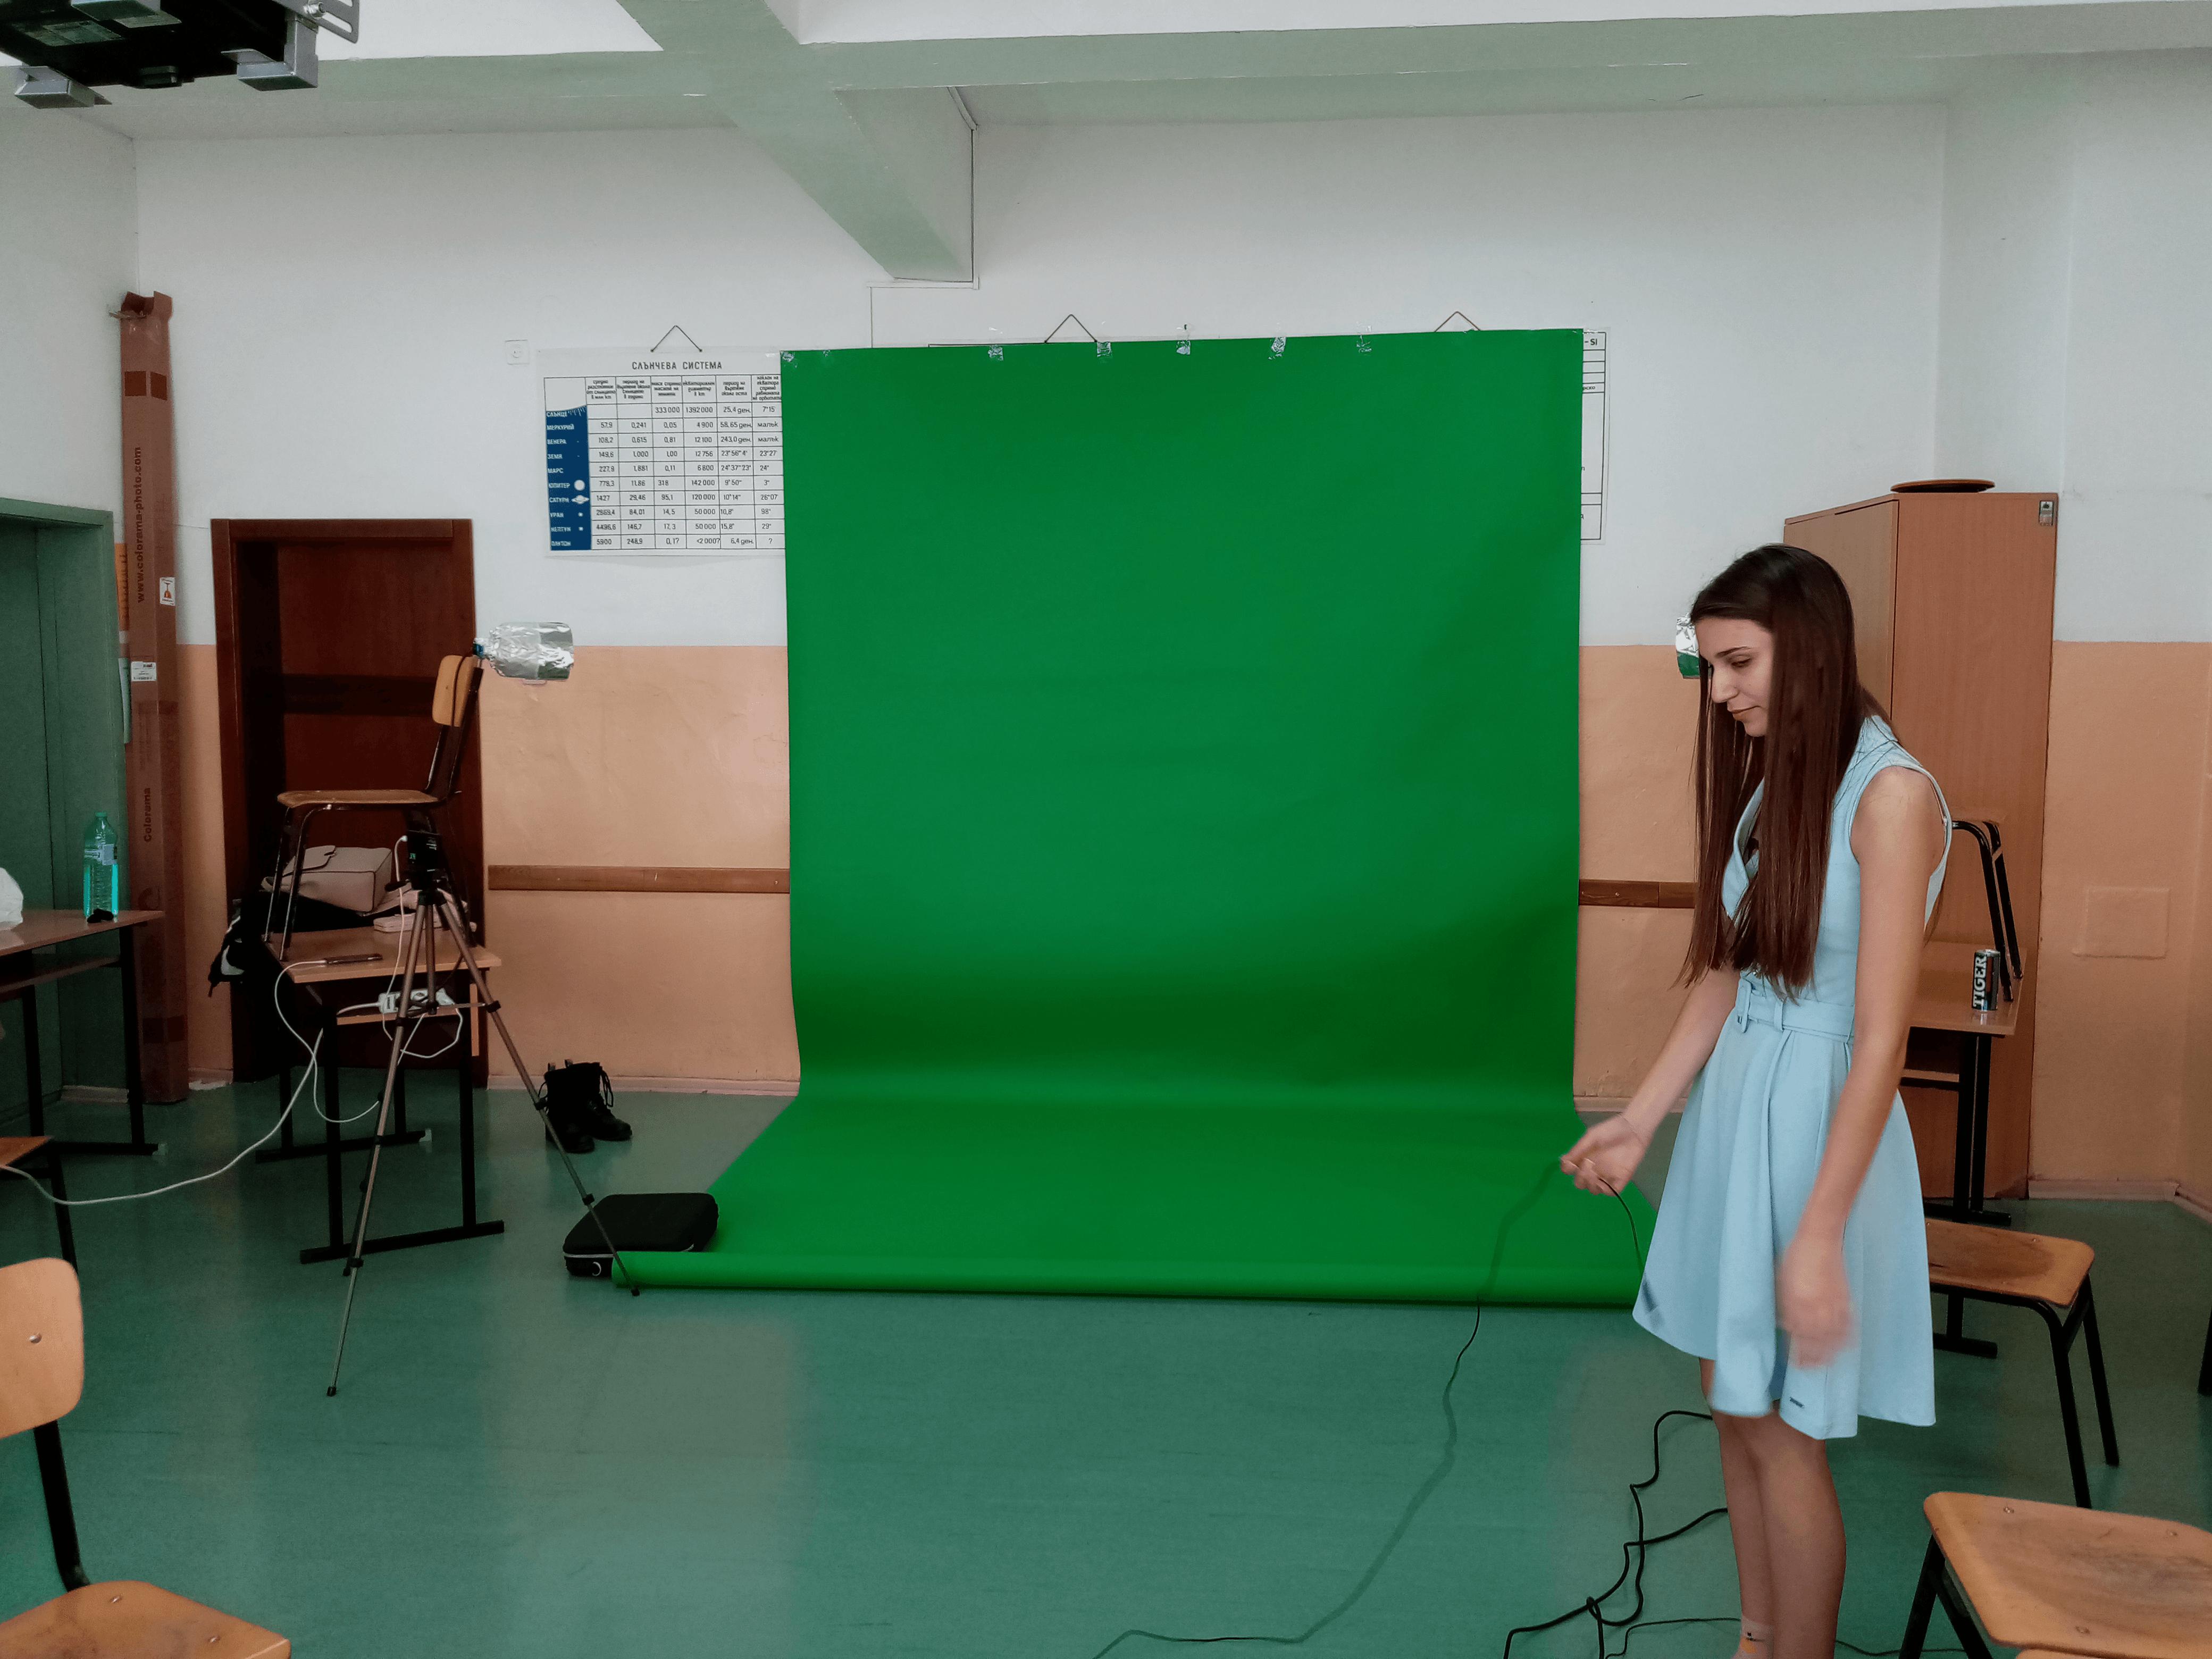 Slide 2 - ППМГ ТВ Сливен - Един ден на снимачната площадка